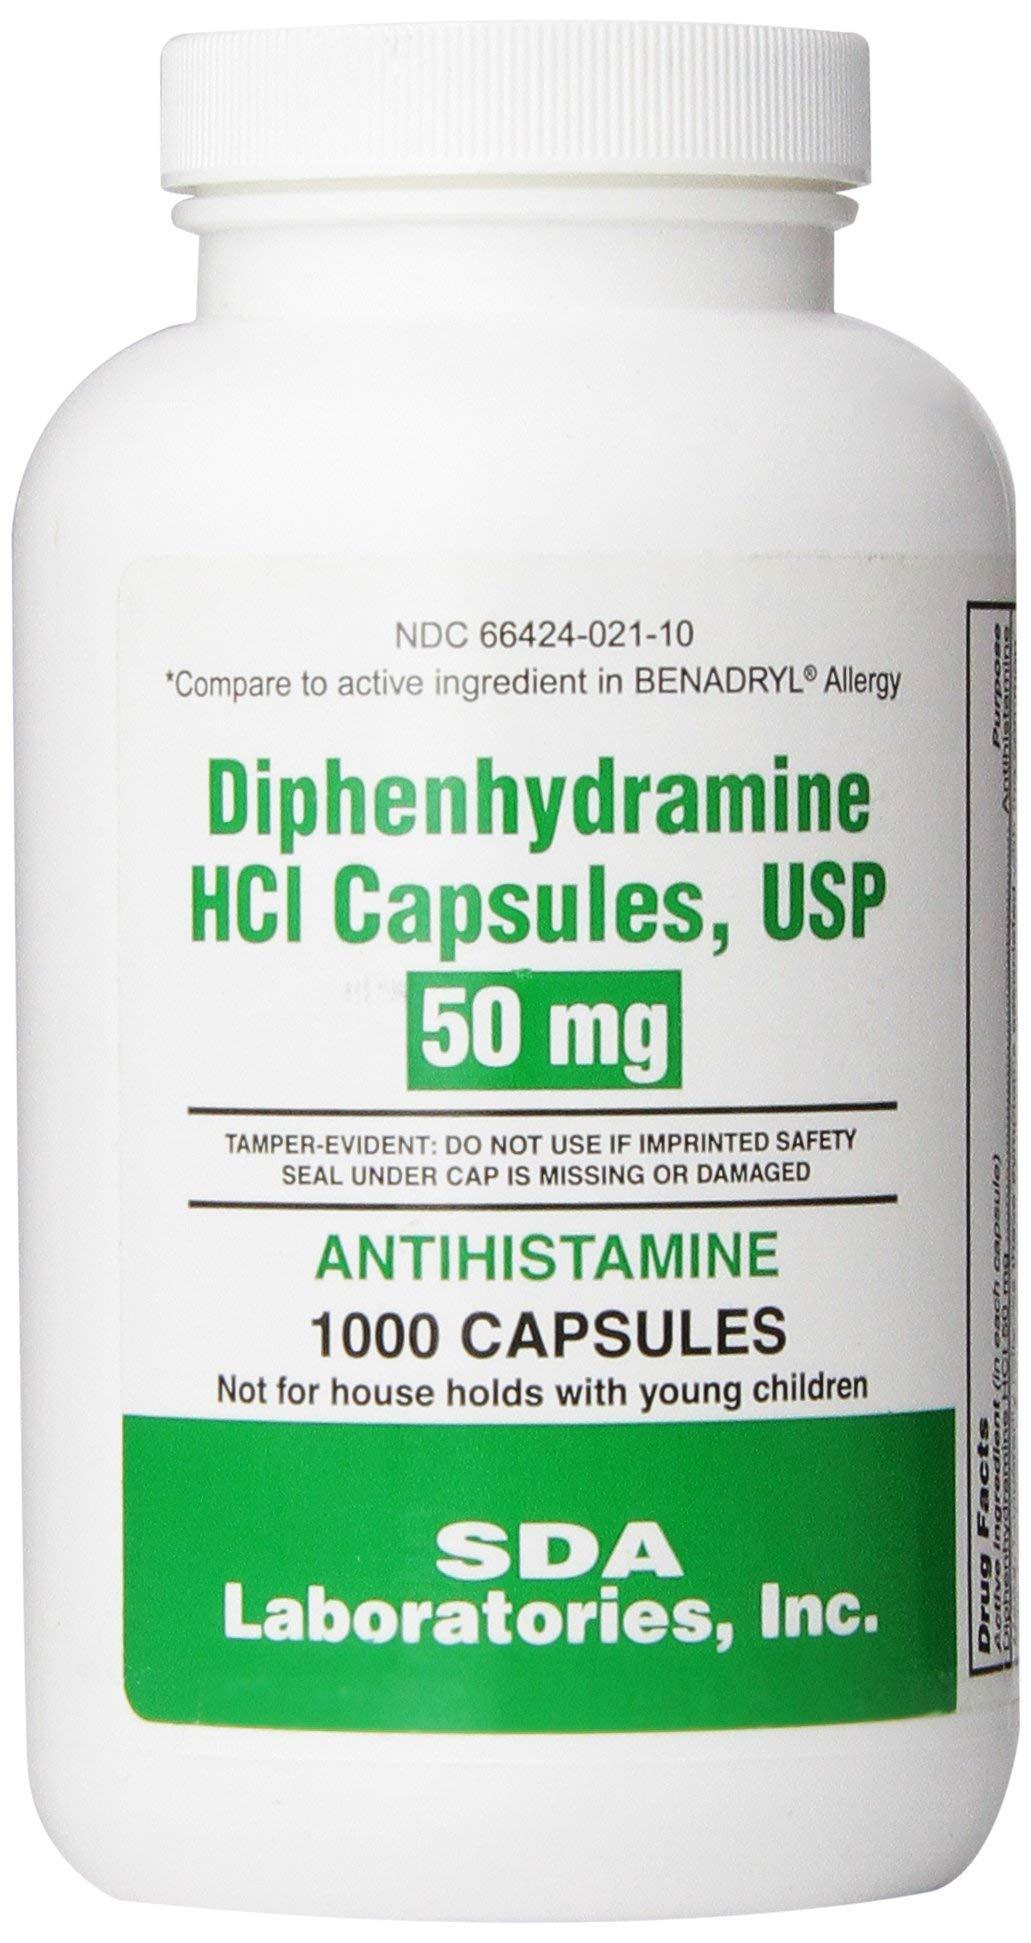 SDA Laboratories, INC Generic Benadryl Allergy - Diphenhydramine (50mg) - 1000 Capsules by SDA LABORATORIES